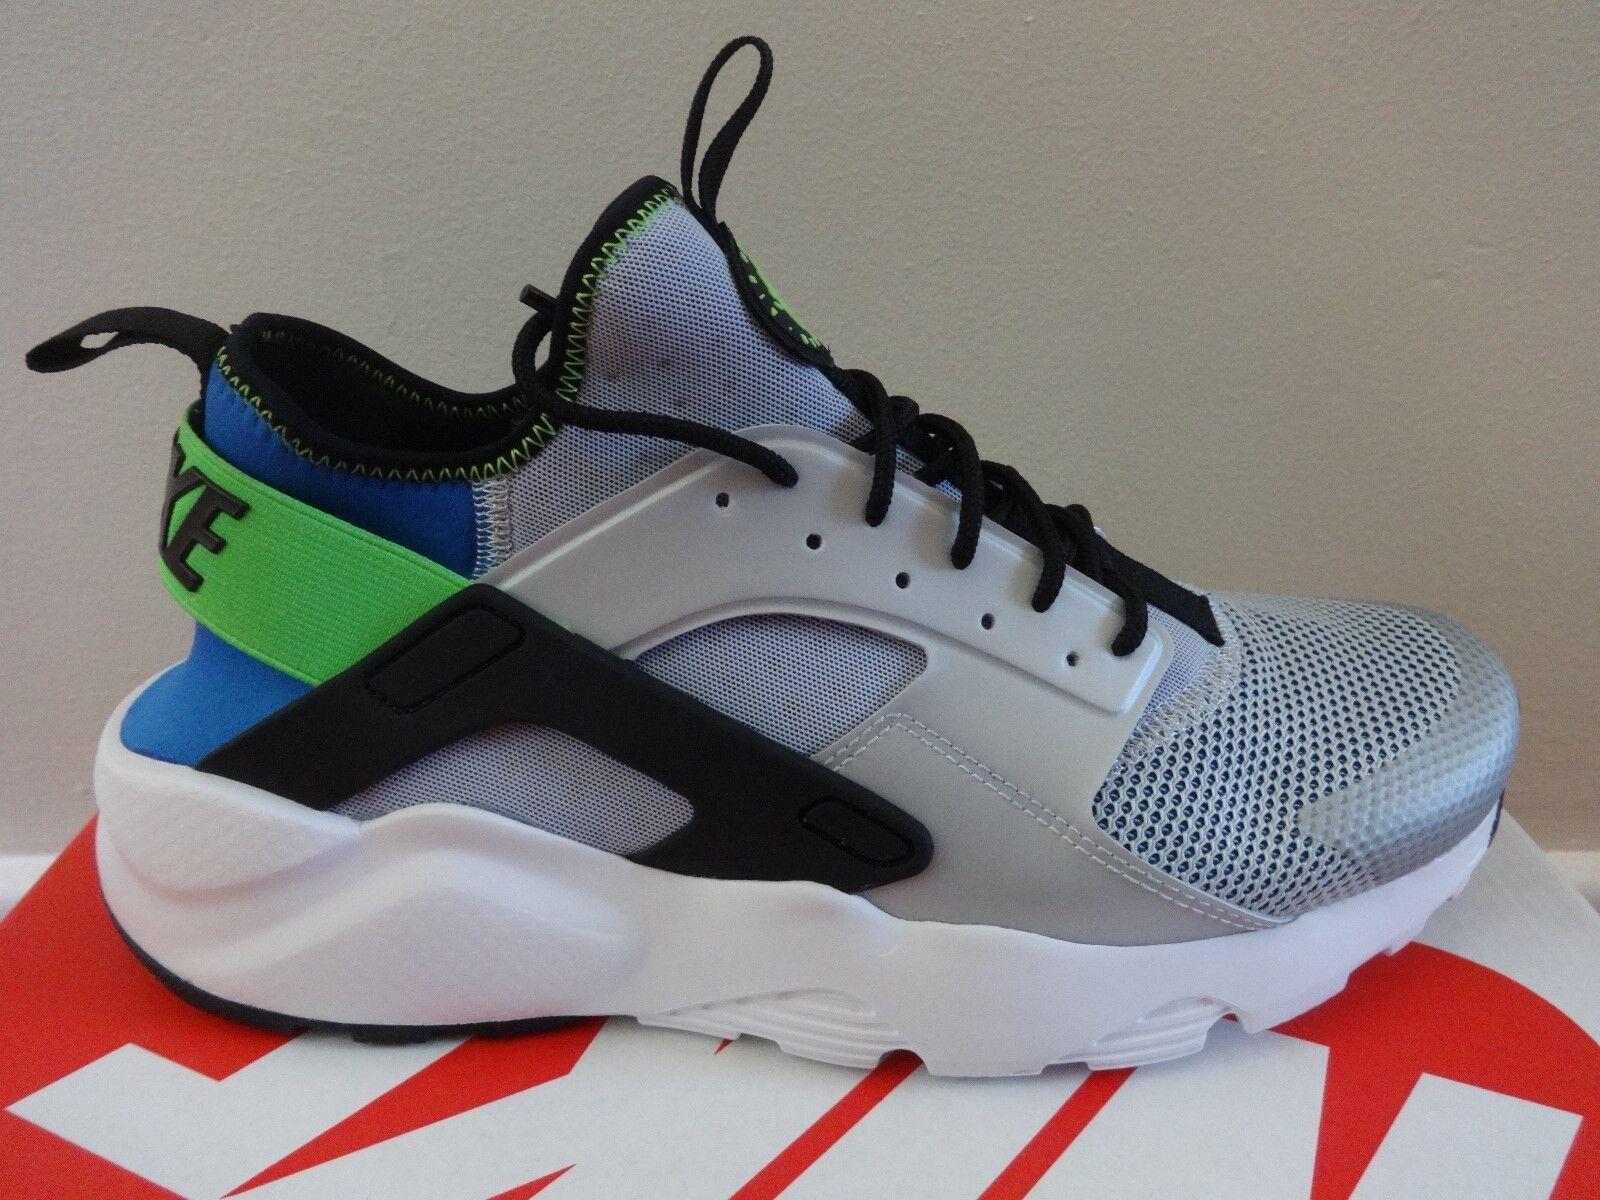 Nike air huarache Uomo formatori scarpe 819685 400 ue noi 9 nuovi   box